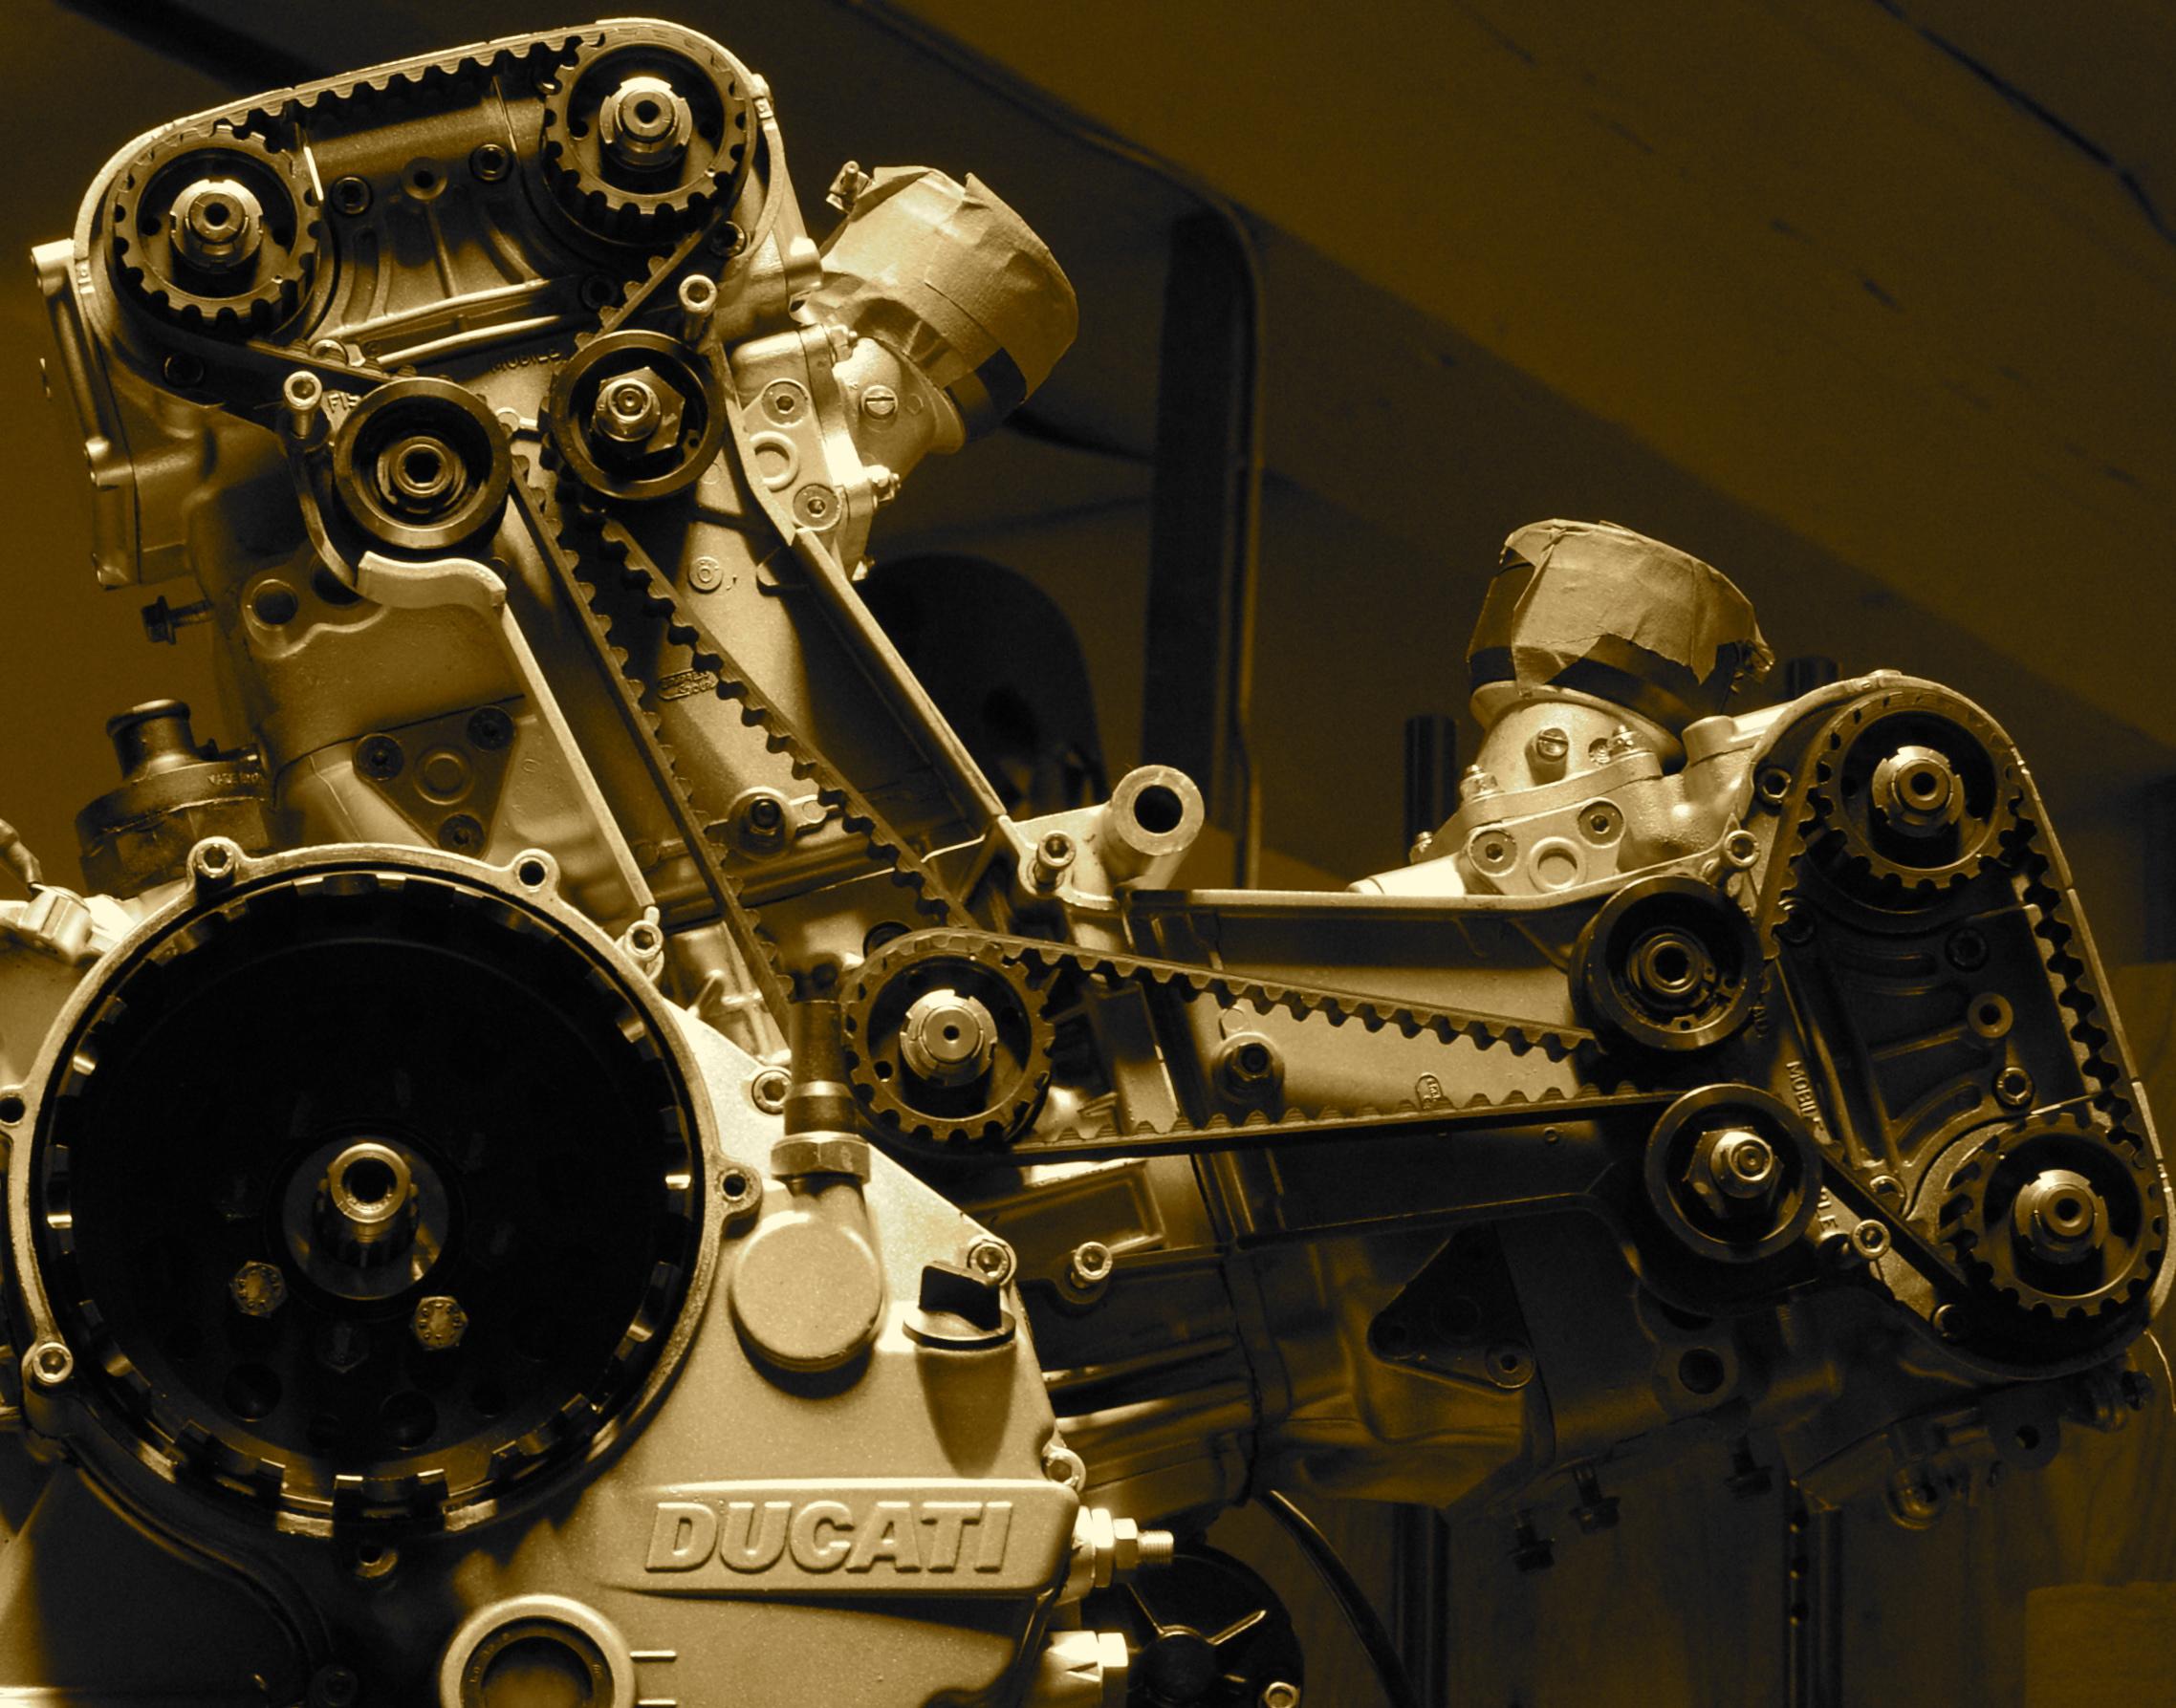 Ducati 853 build